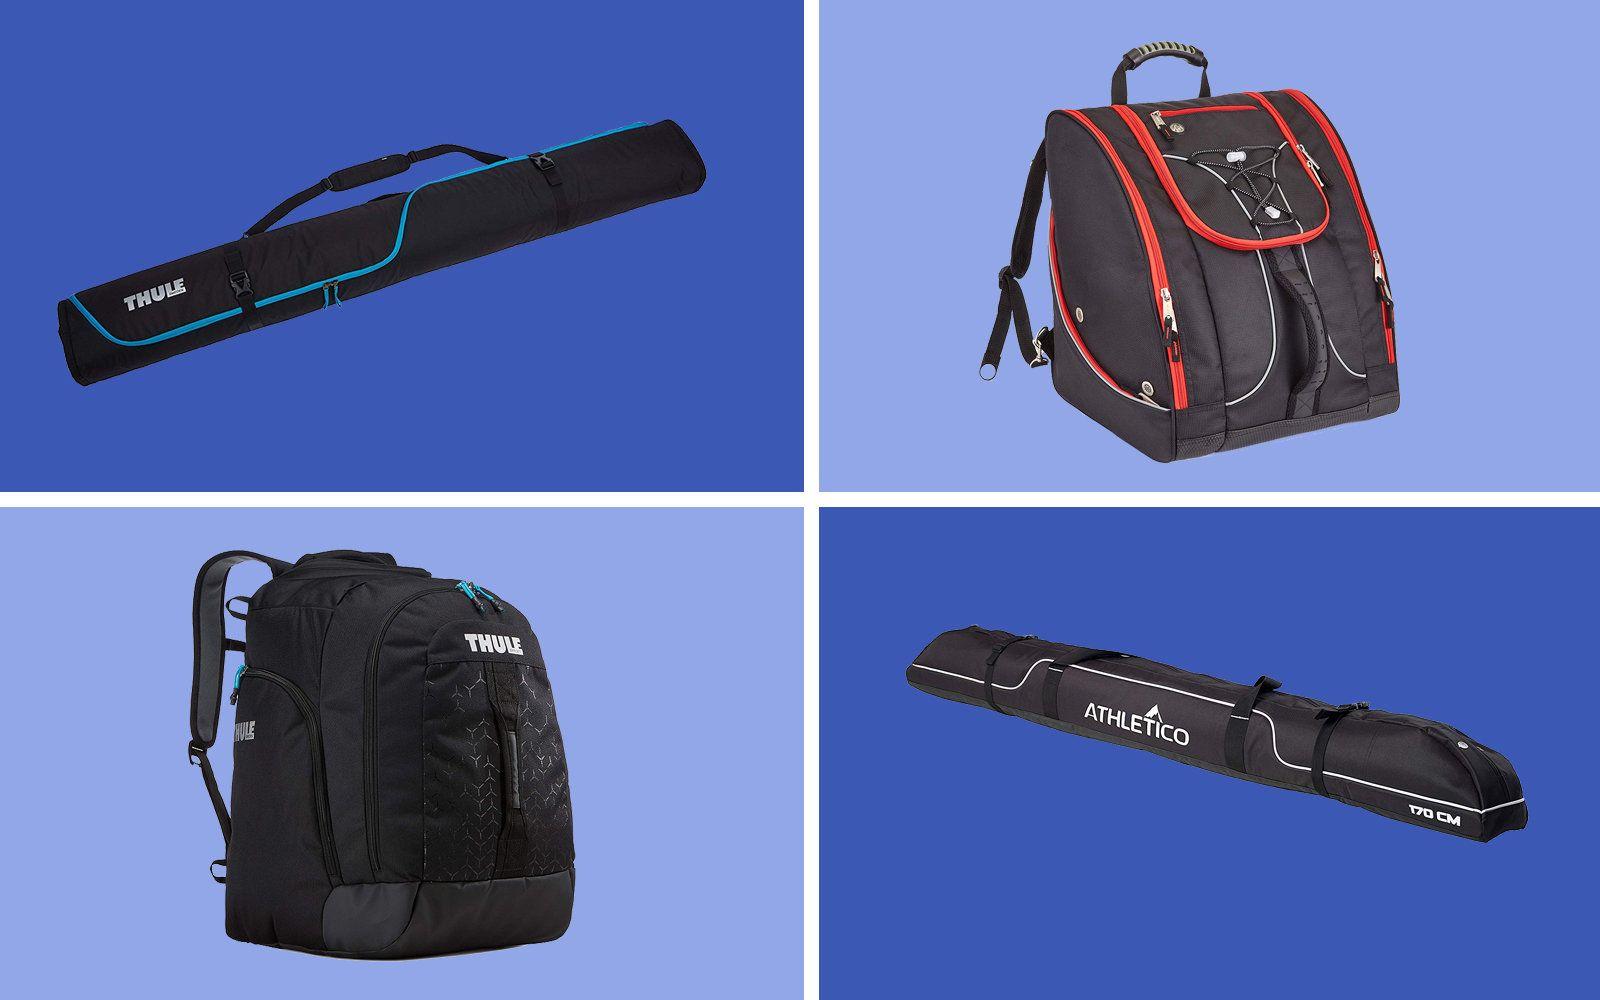 The Best Ski Bags For 2020 According To Avid Skiers In 2020 Ski Bag Best Skis Ski Boot Bags